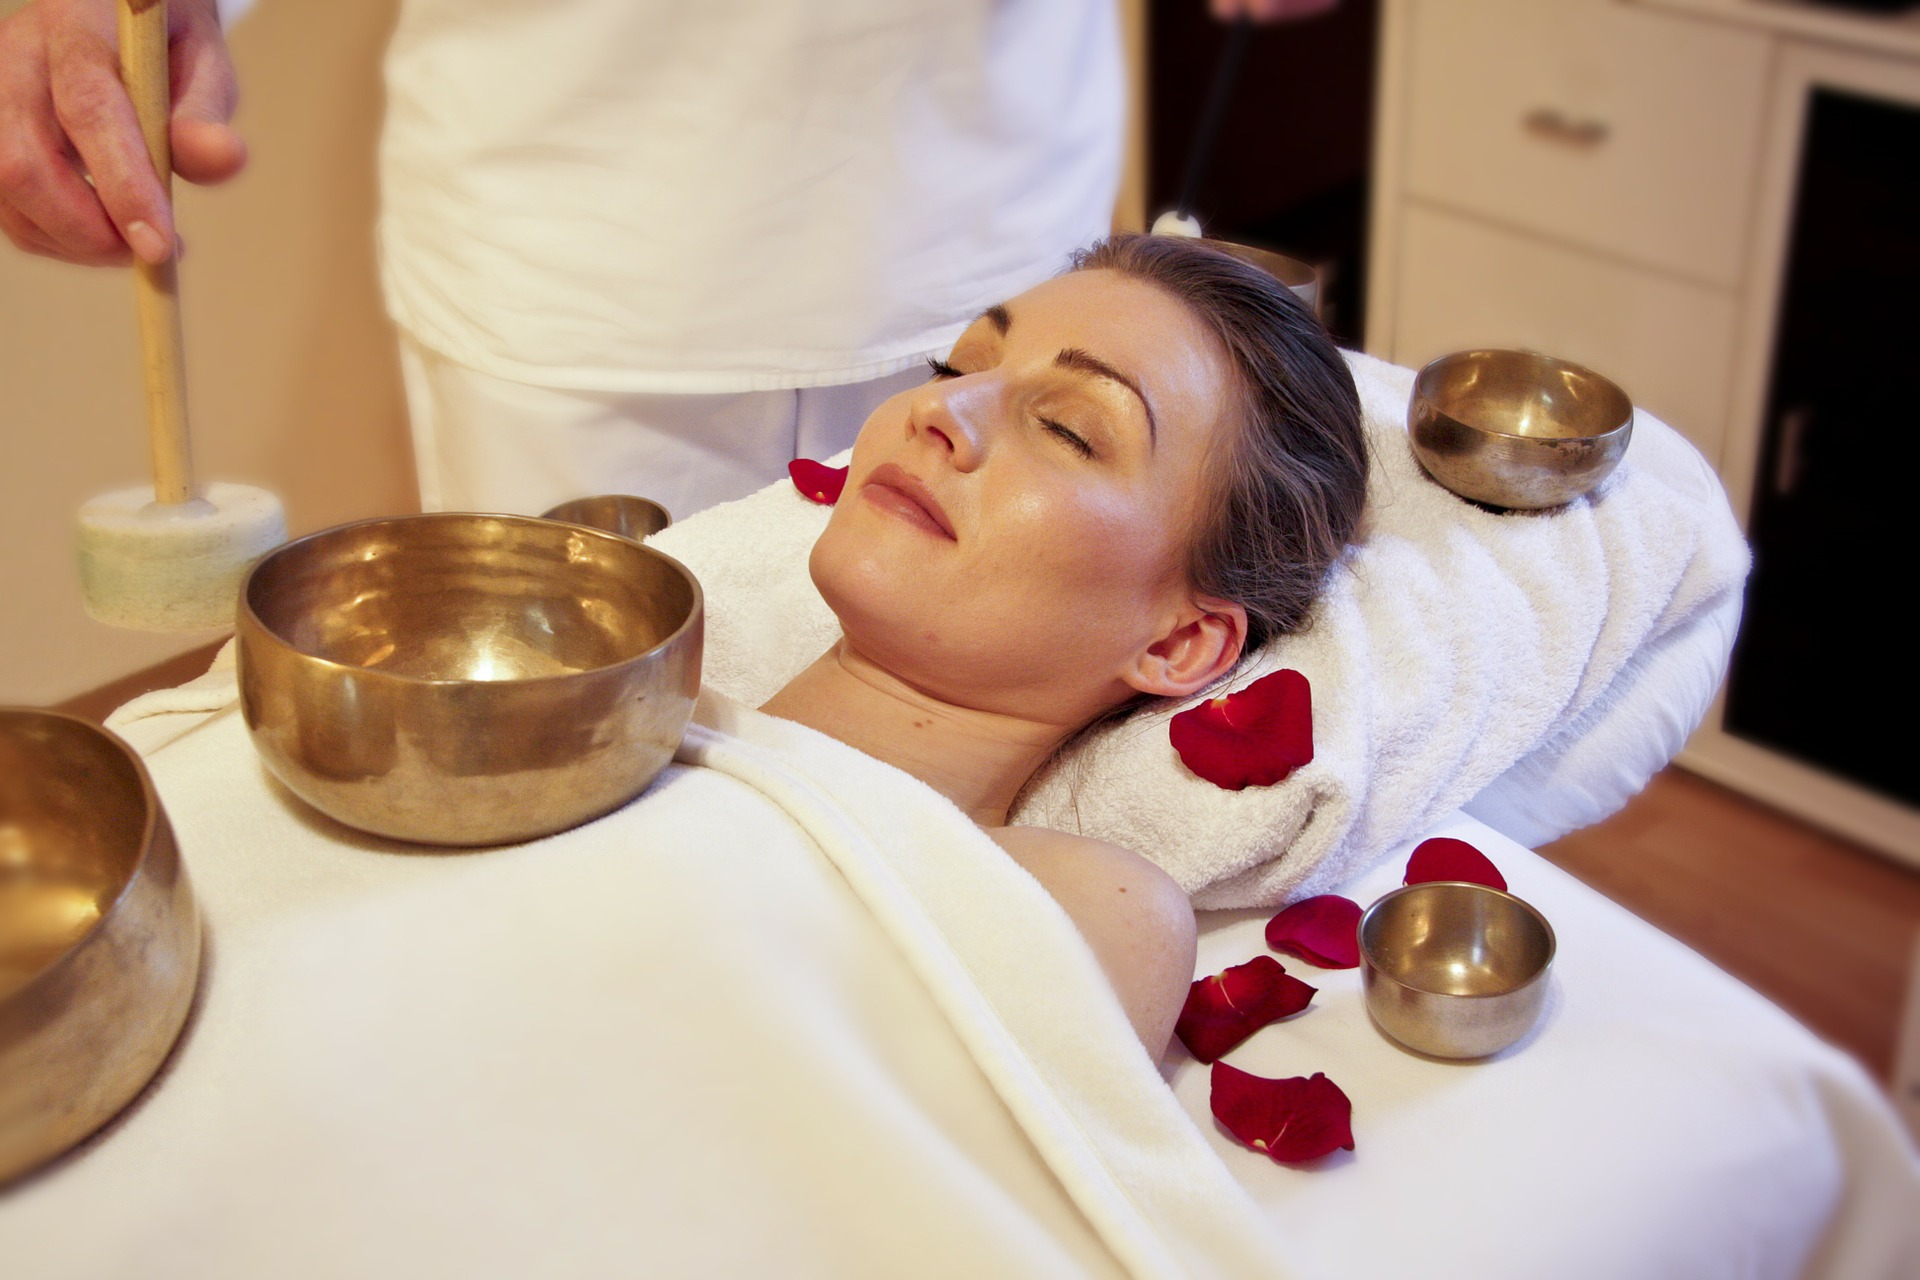 wellness-sound-healing-spa-treatment-singing-bowls.jpg